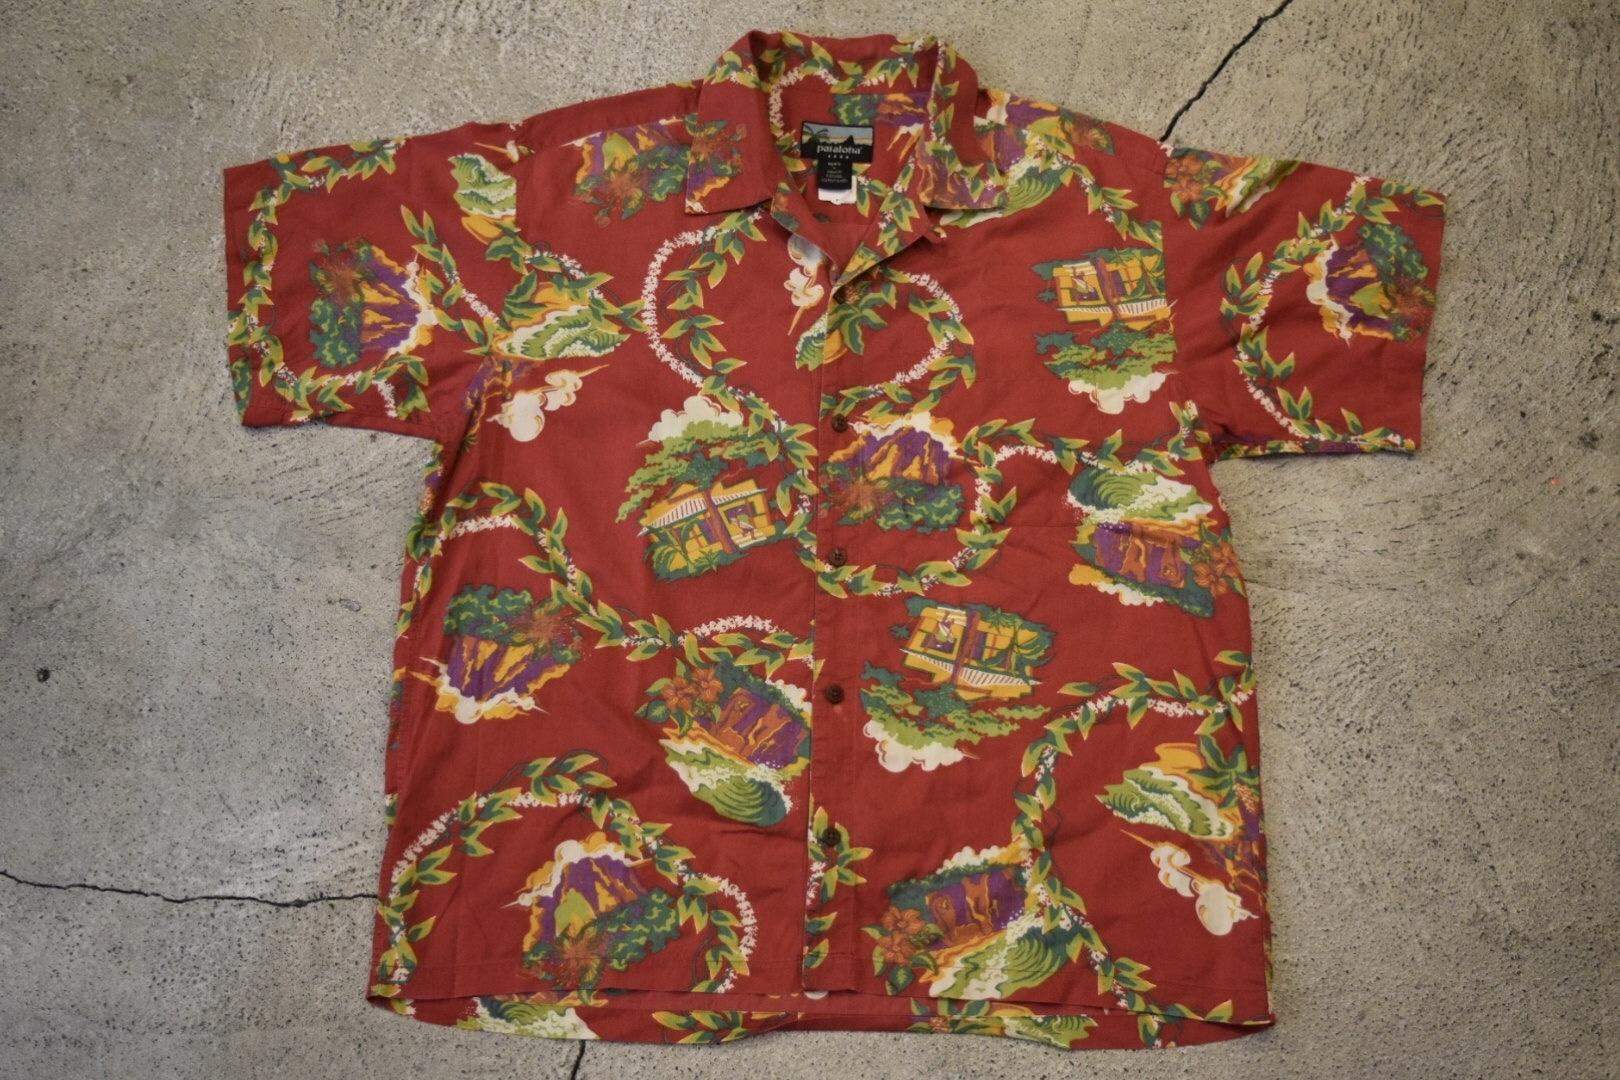 USED pataloha Haleiwa shirt Fenix red L  patagonia S0154